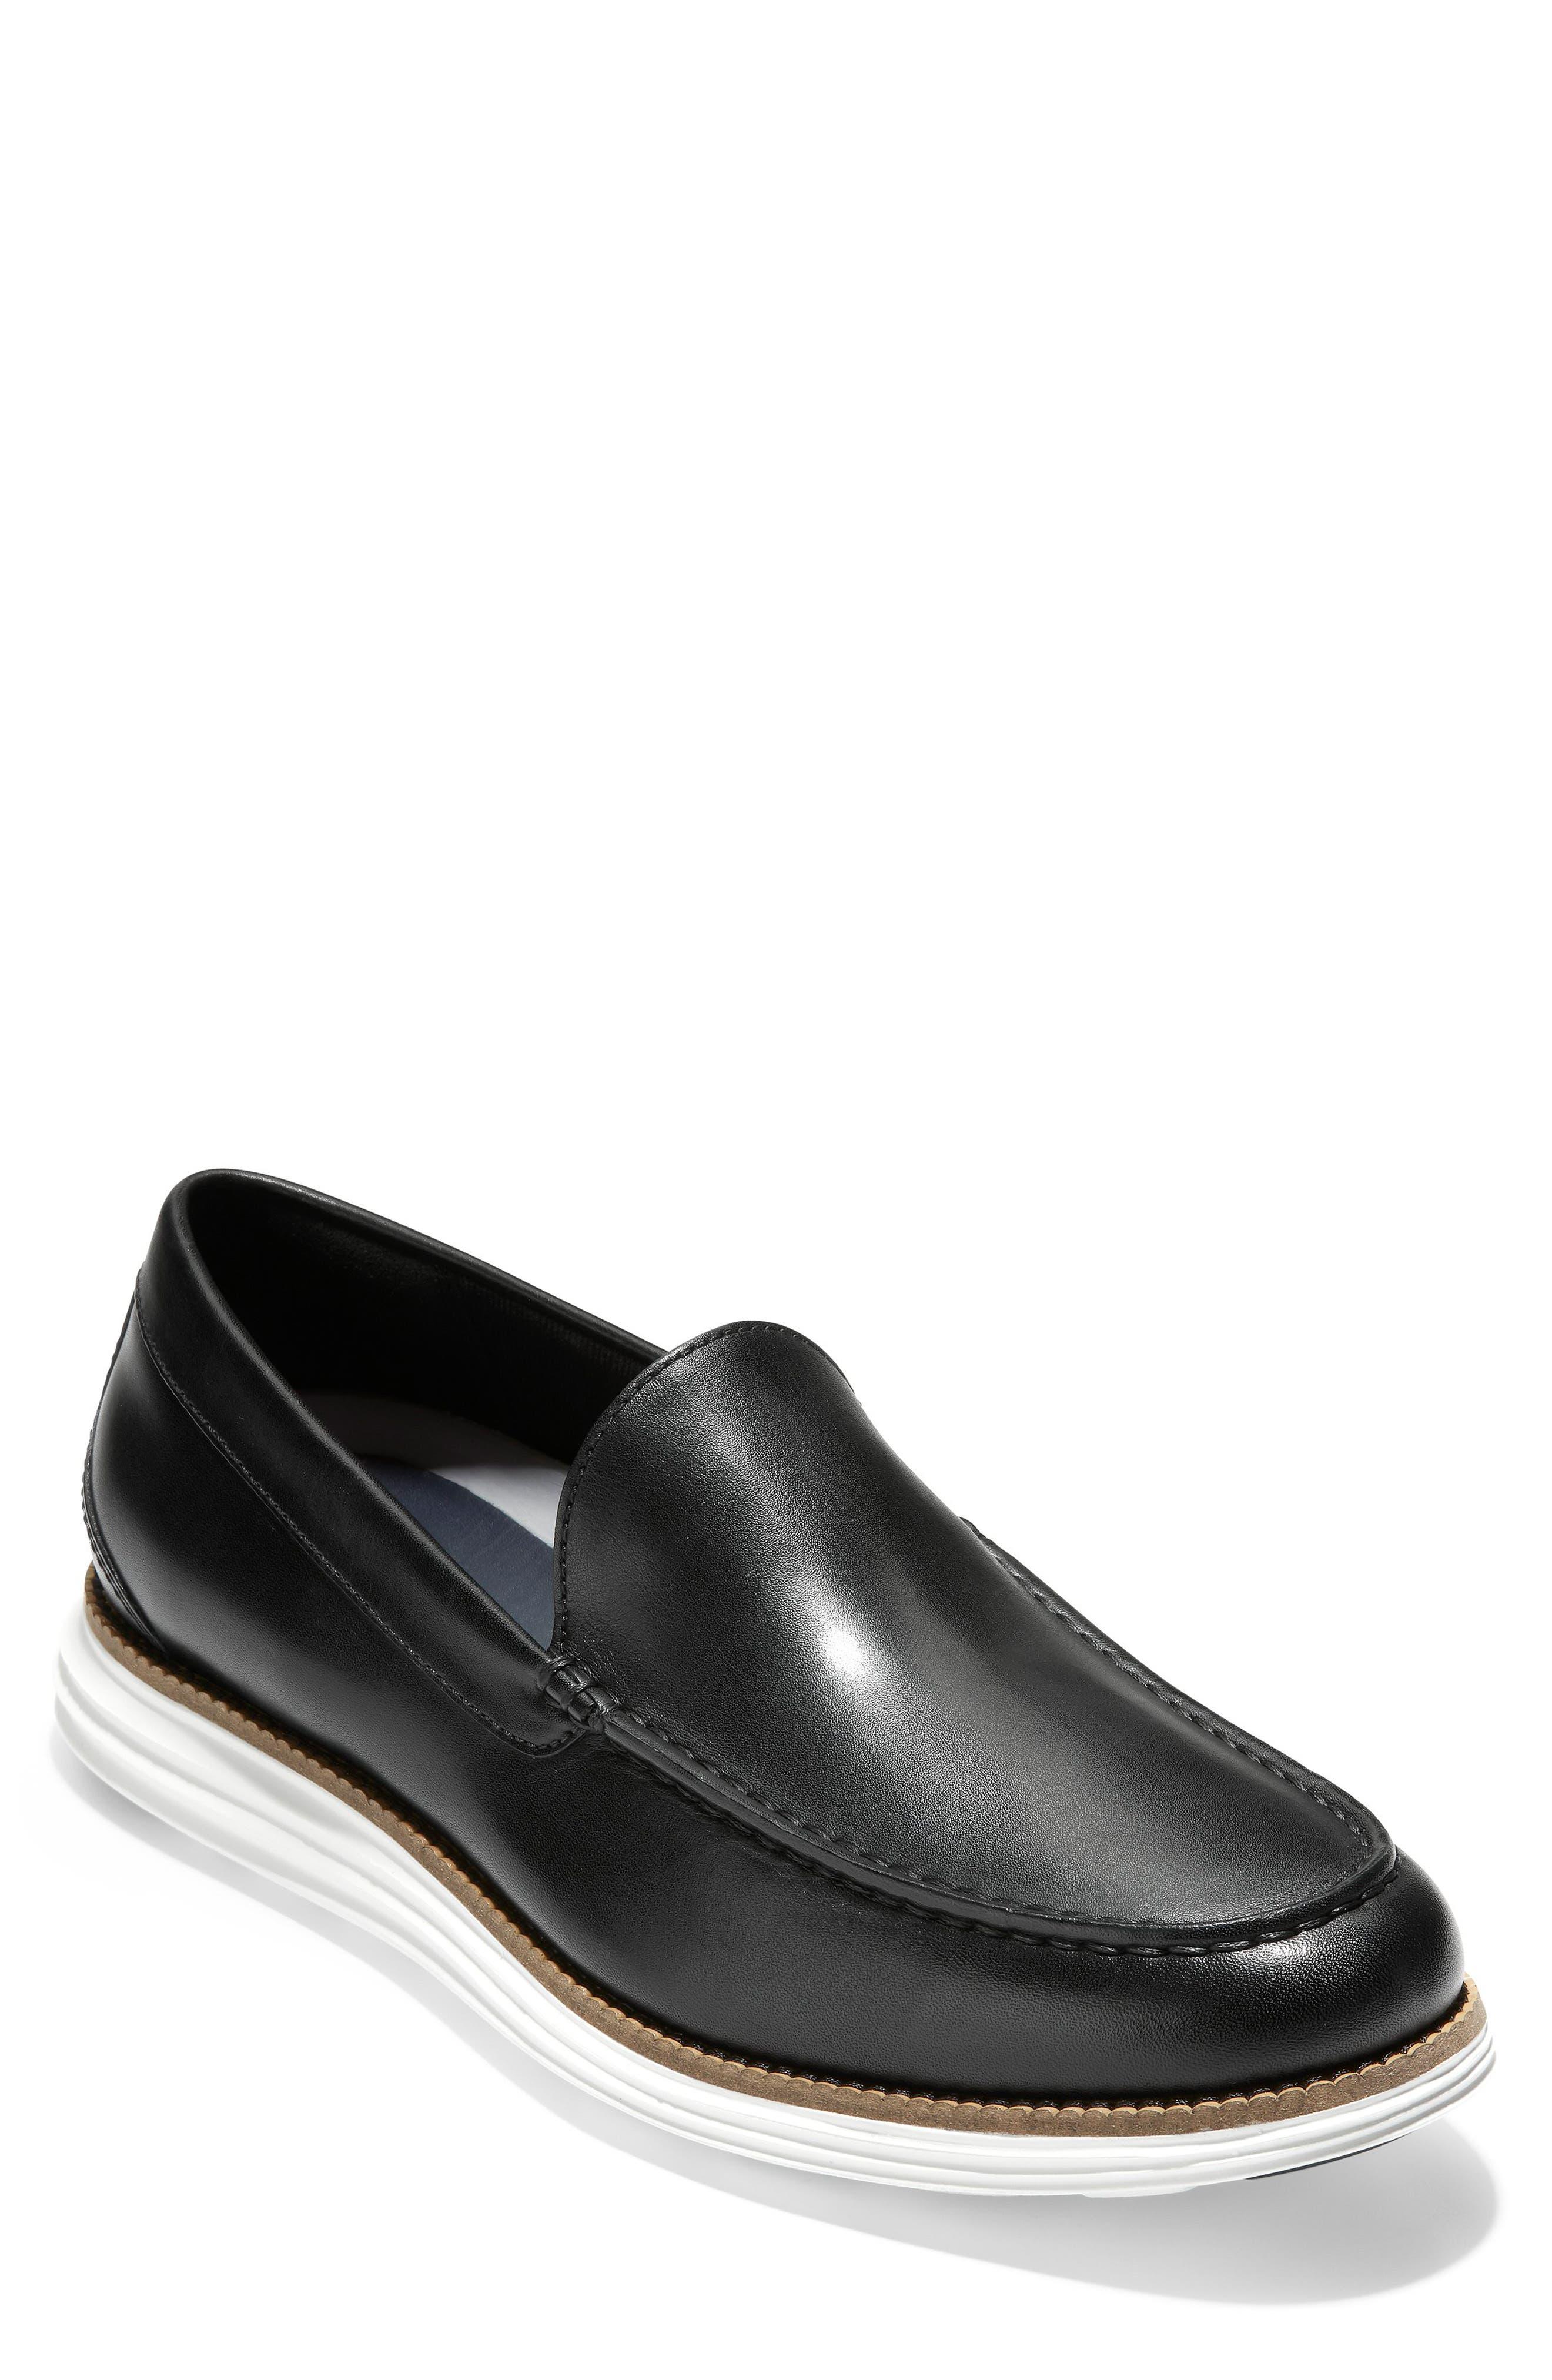 Original Grand Loafer,                             Main thumbnail 1, color,                             BLACK/ OPTIC WHITE LEATHER